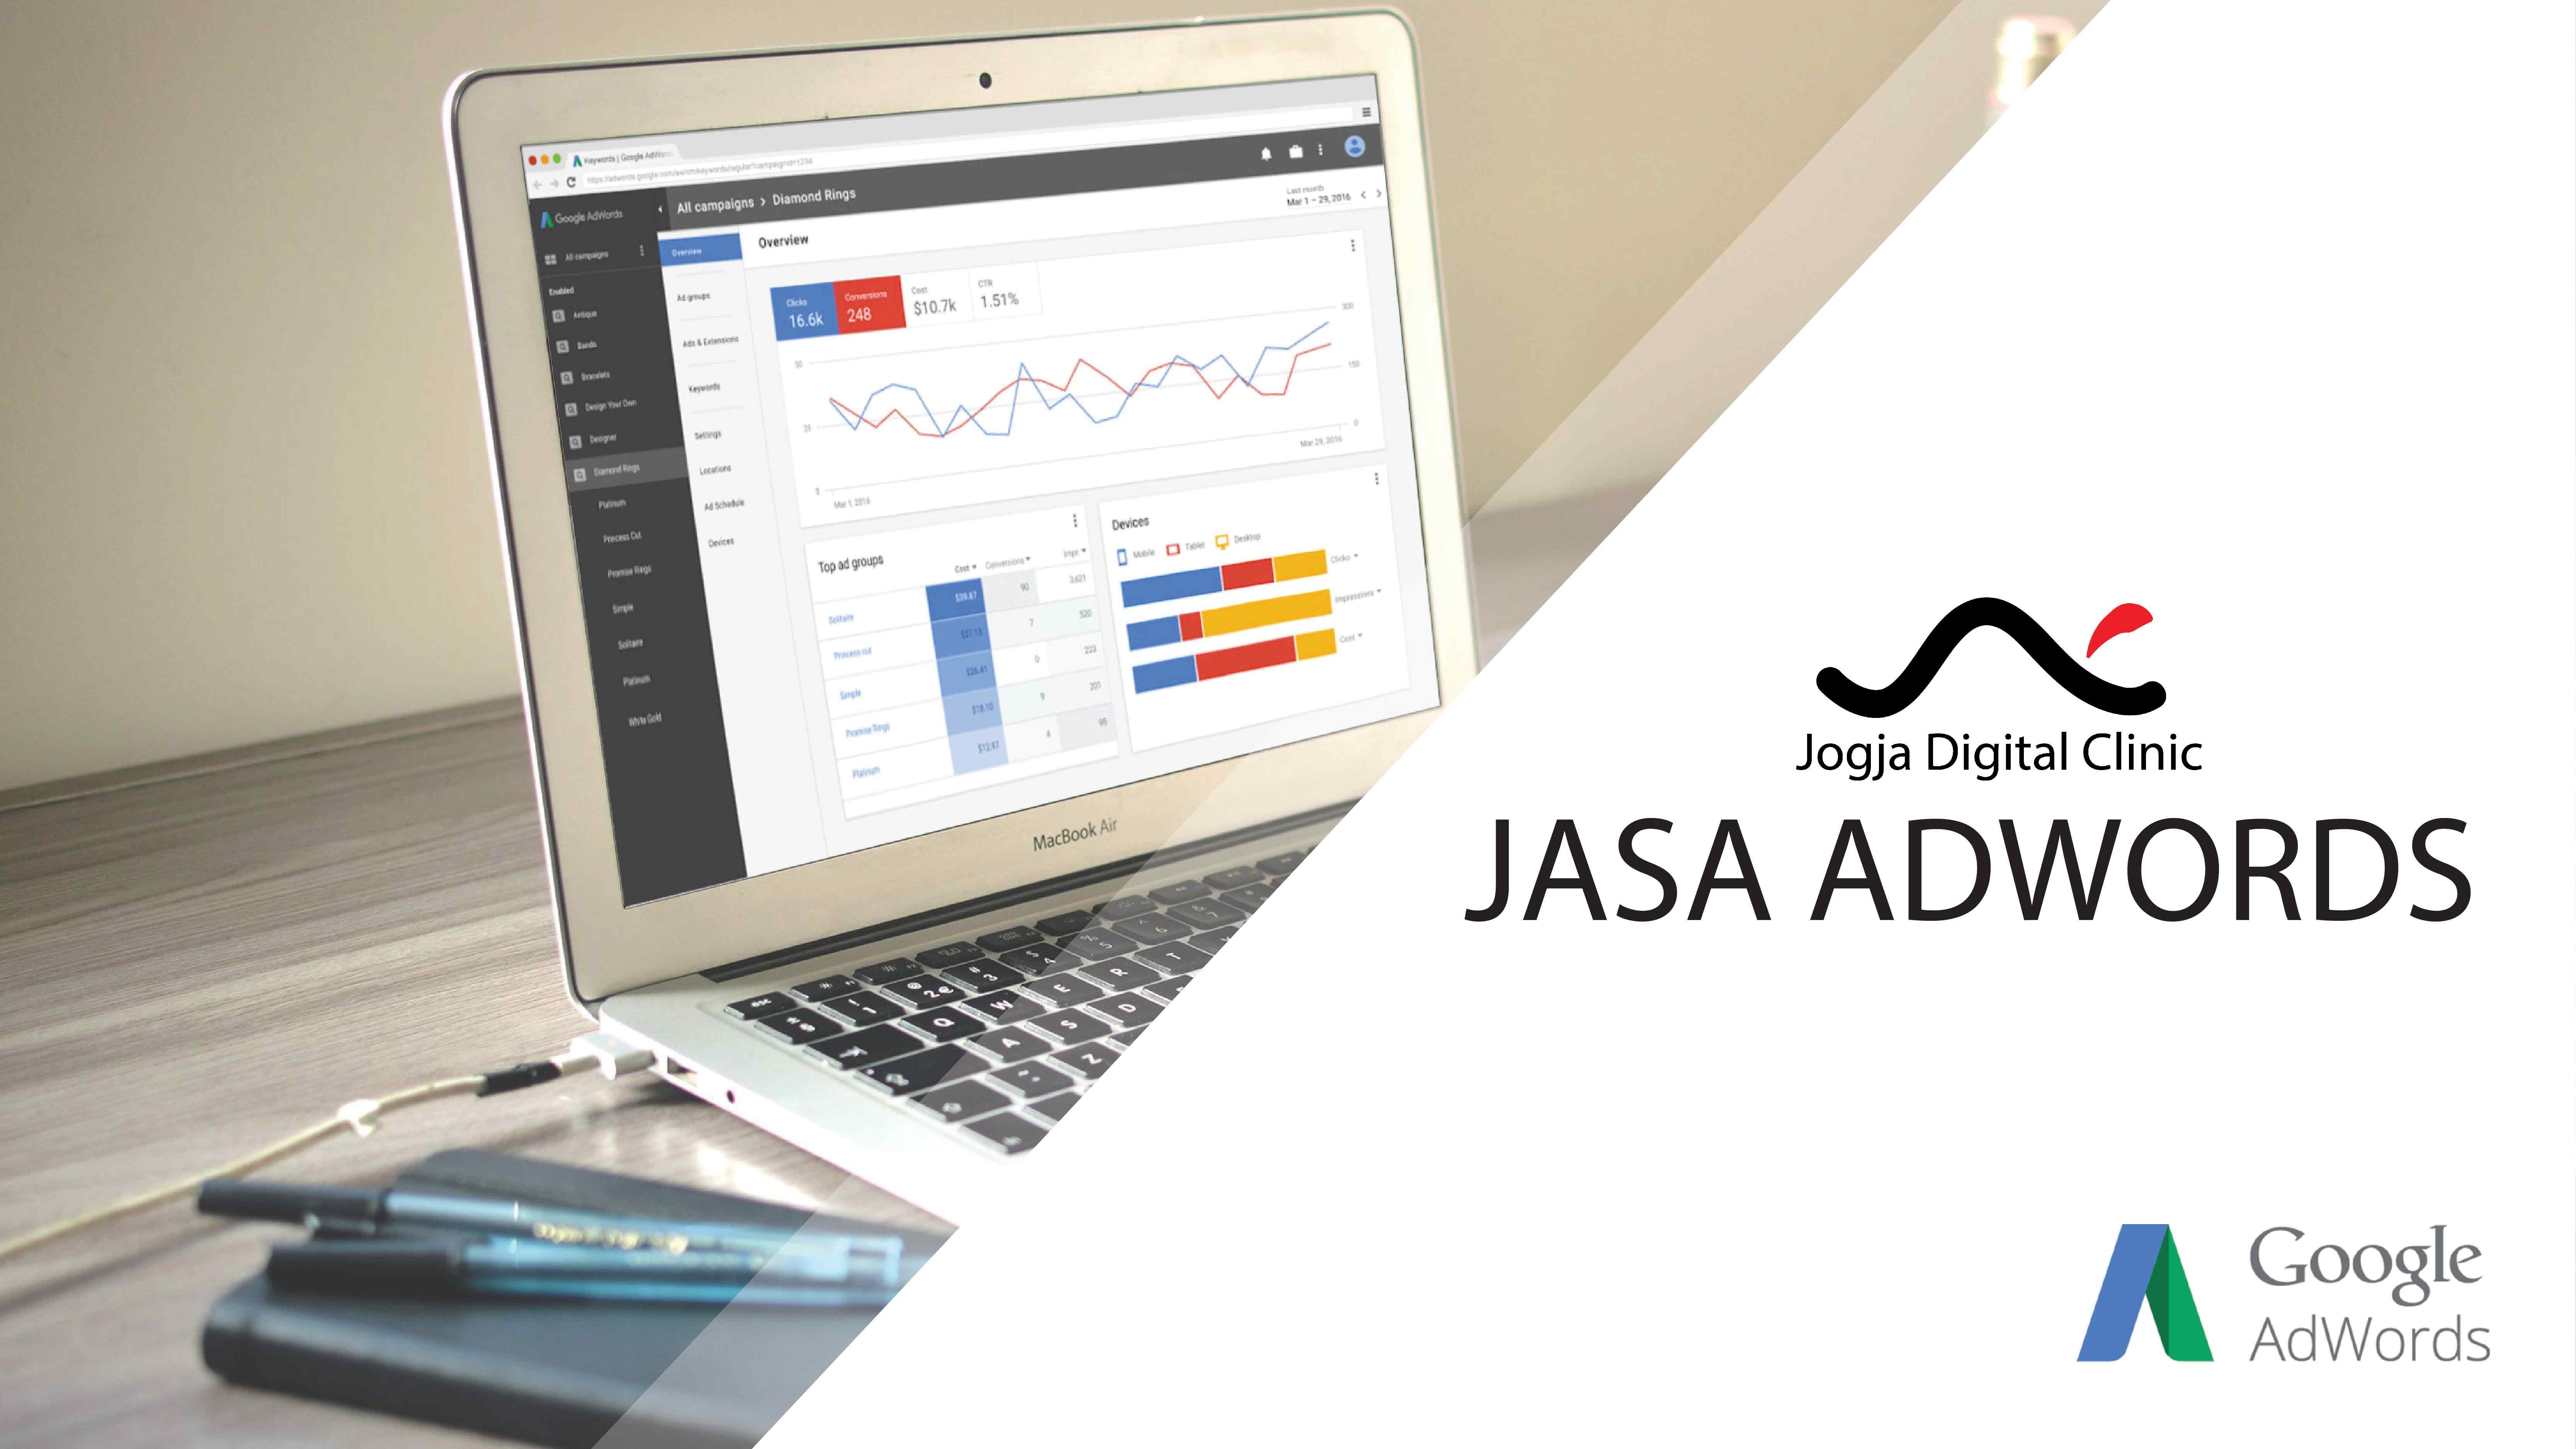 jasa adwords jdc